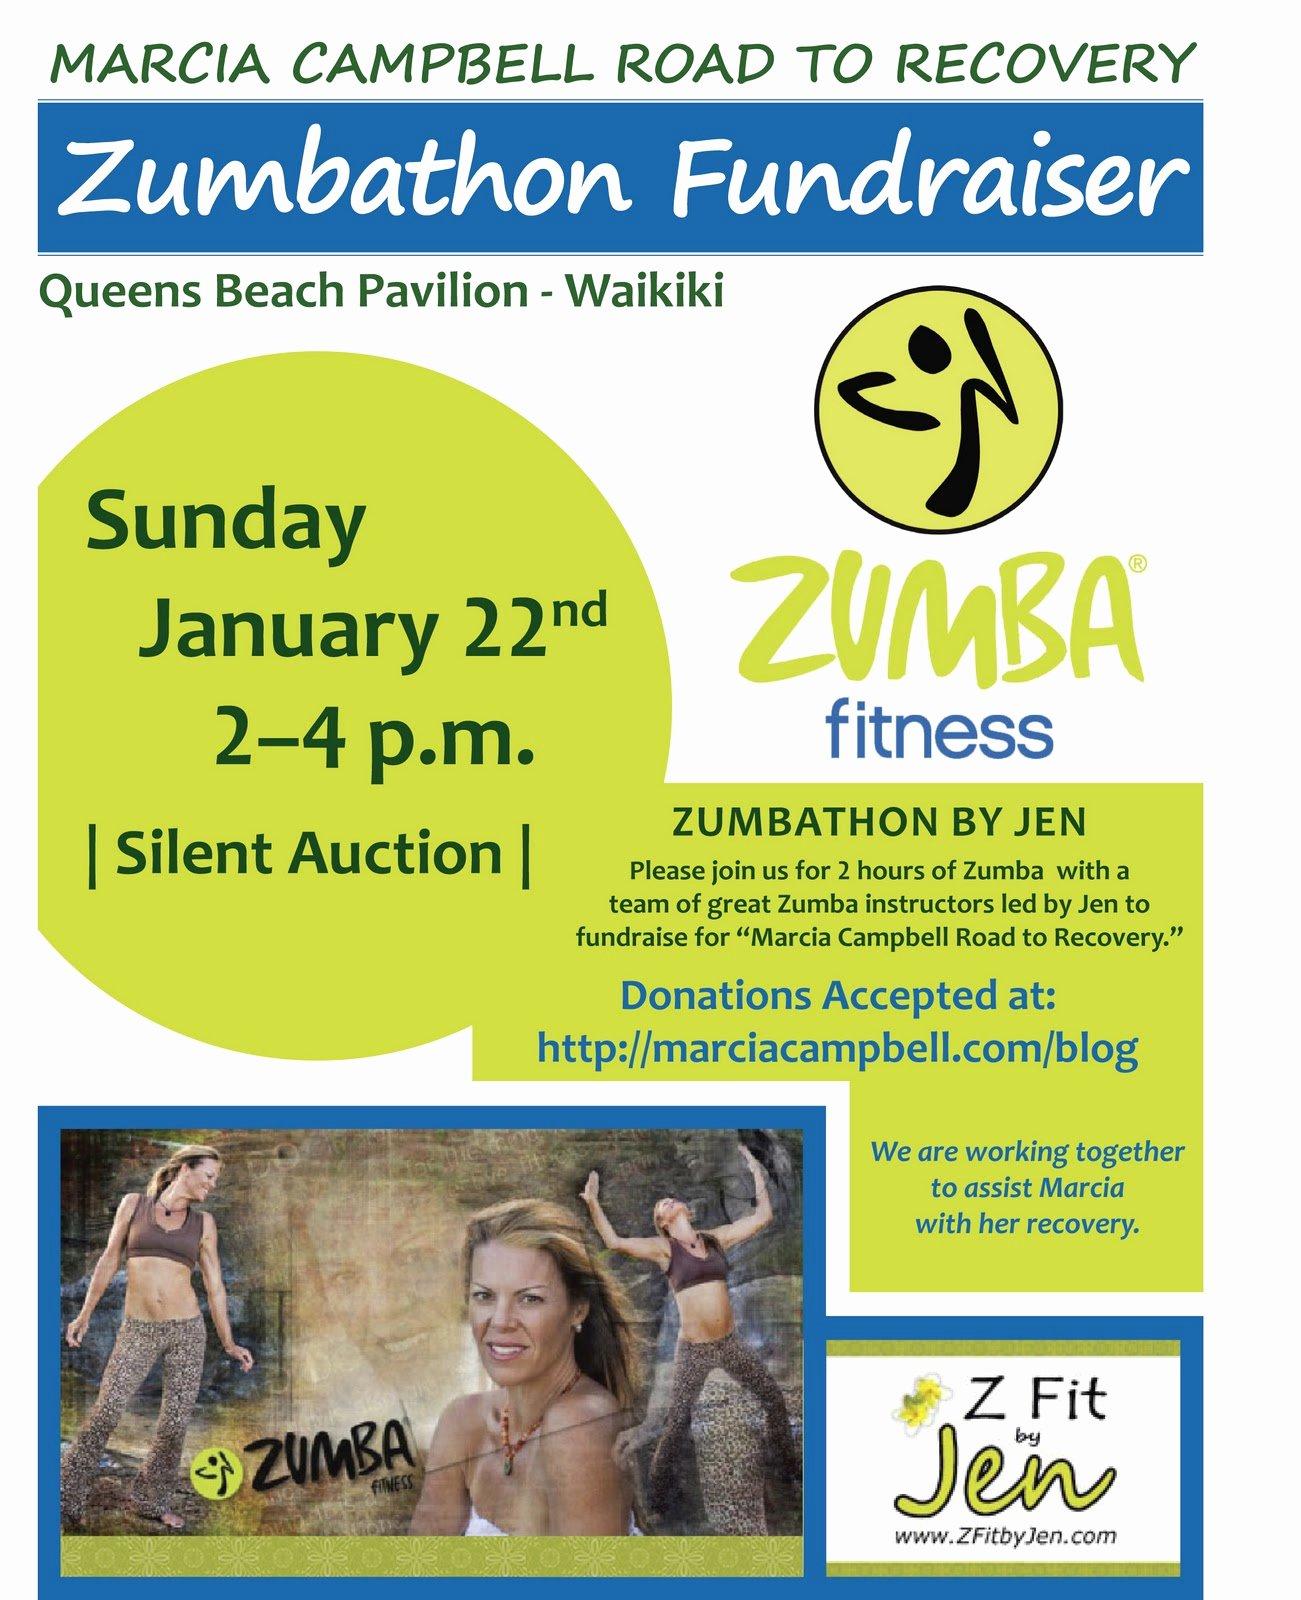 Fundraiser Flyer Template Free Luxury Zumba Flyer Template Free Yourweek 9cbe4beca25e